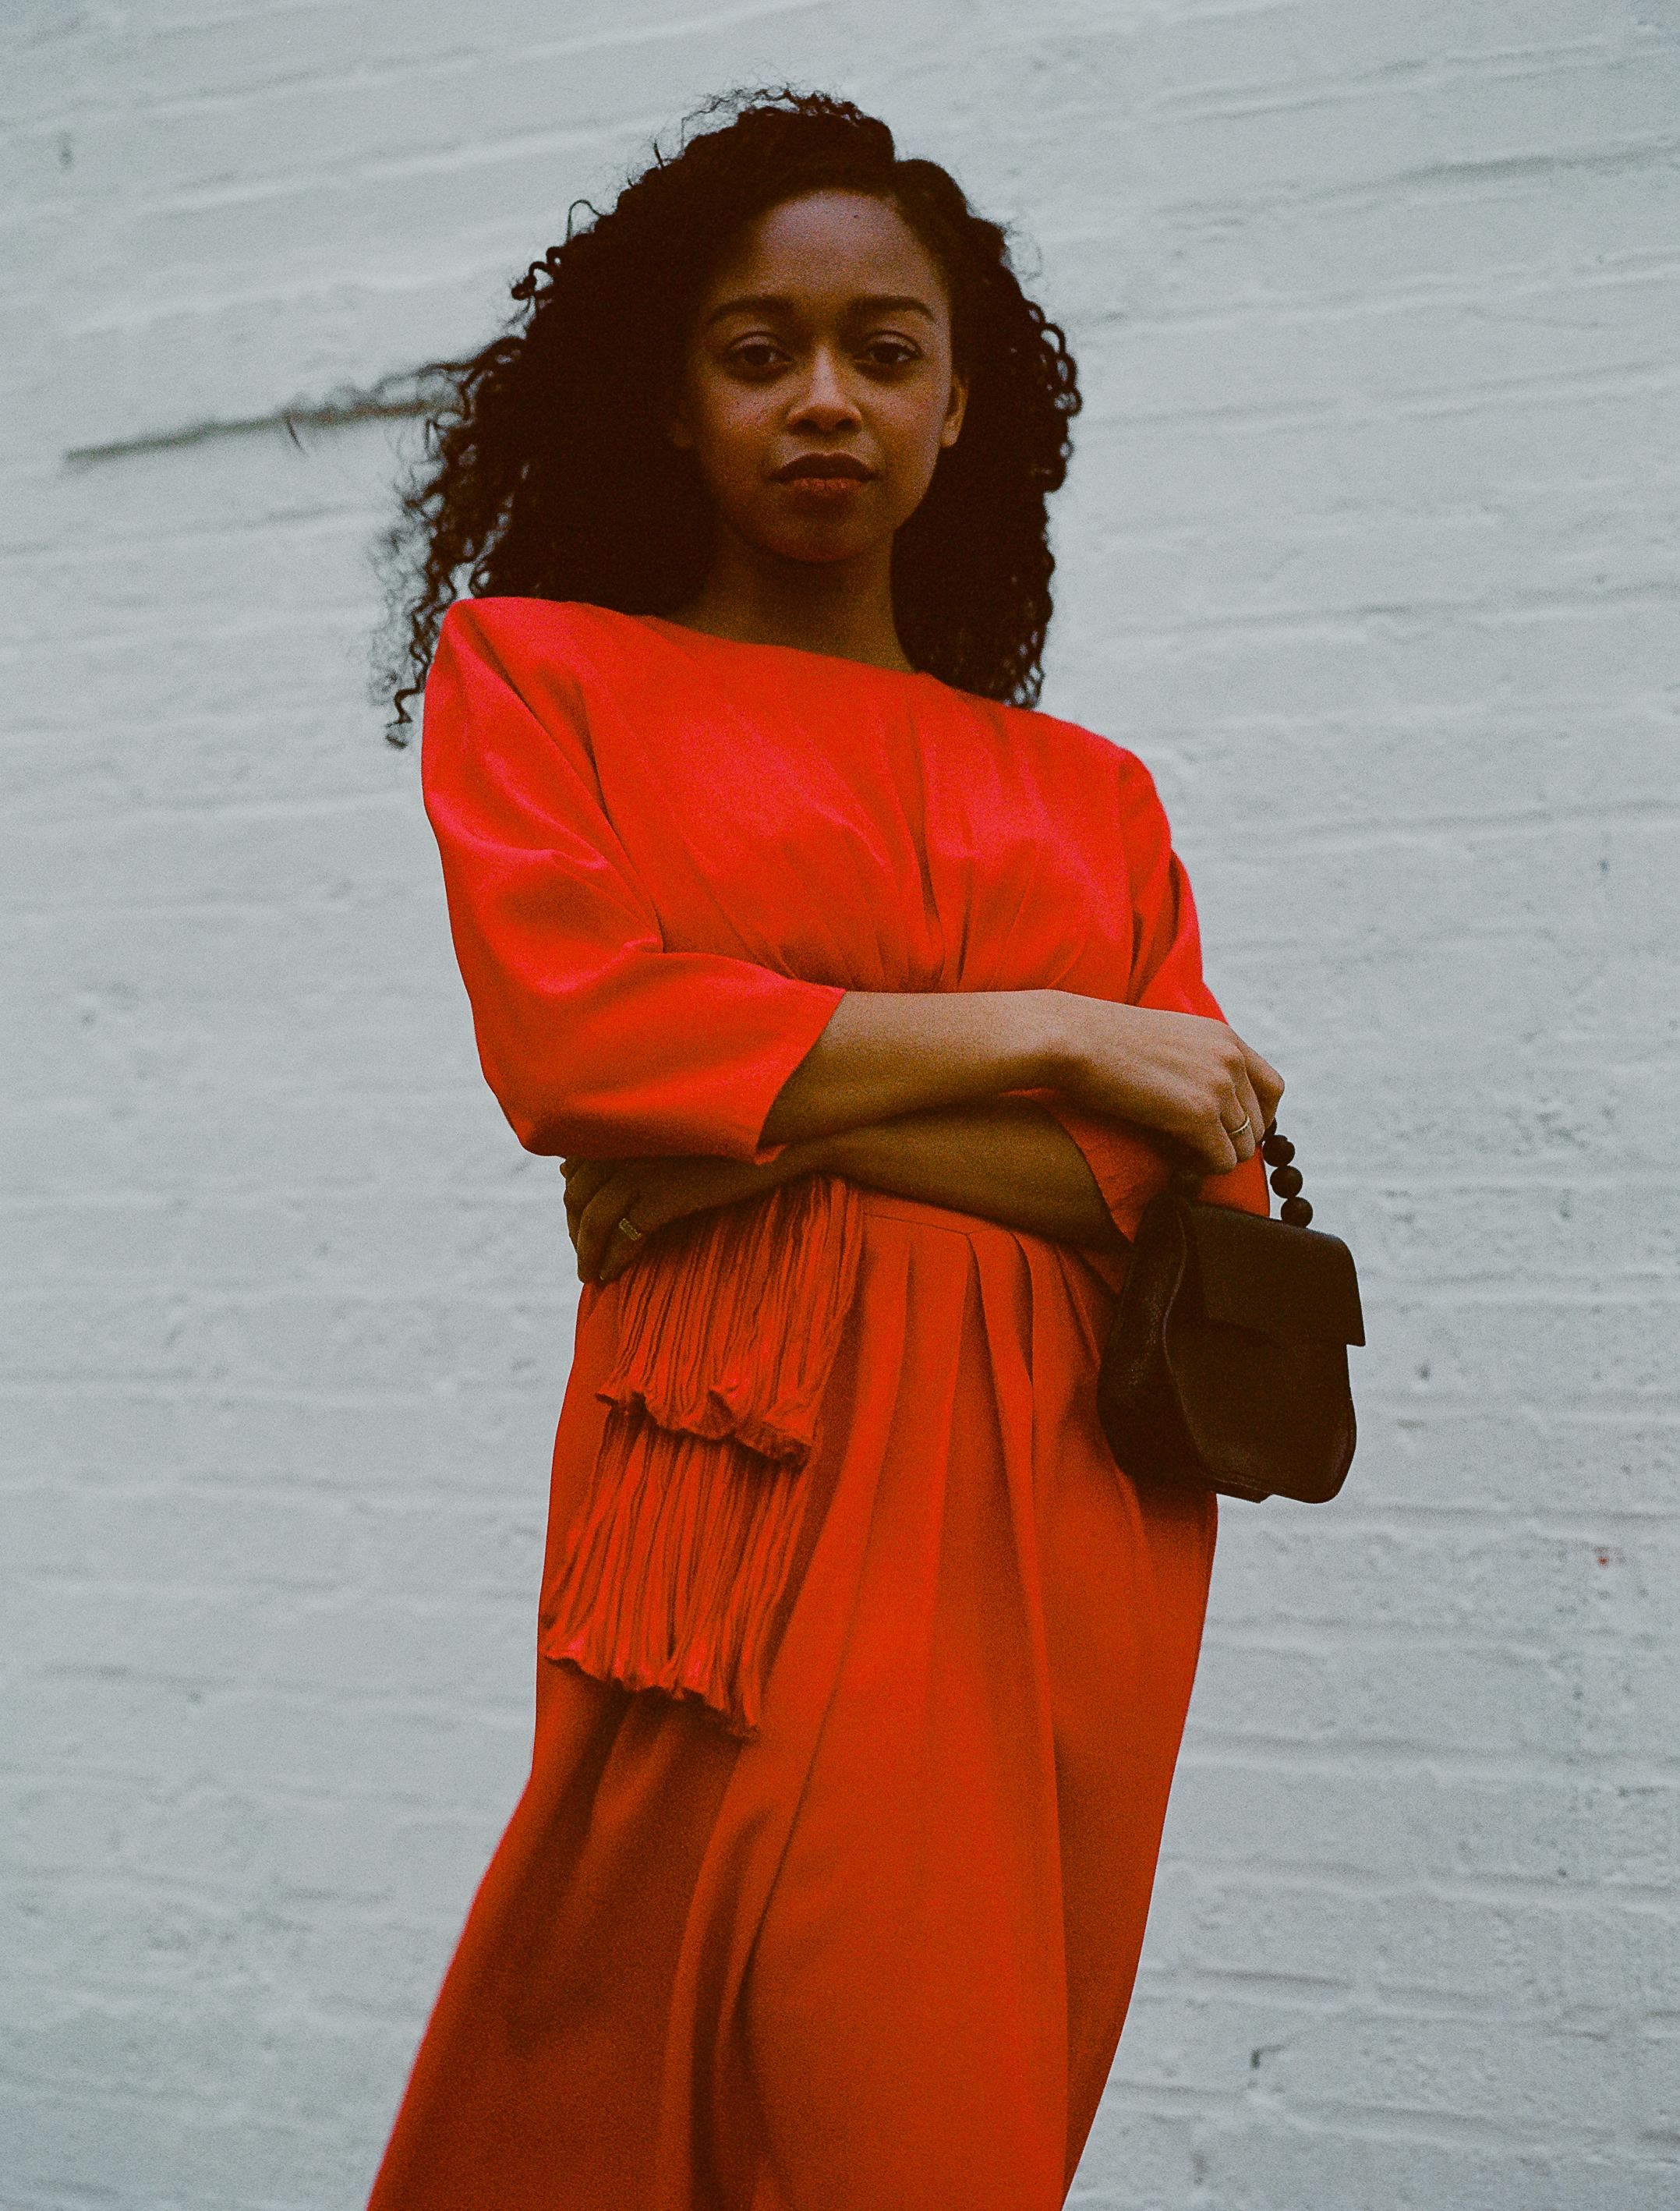 Photo by Jacqueline Harriet